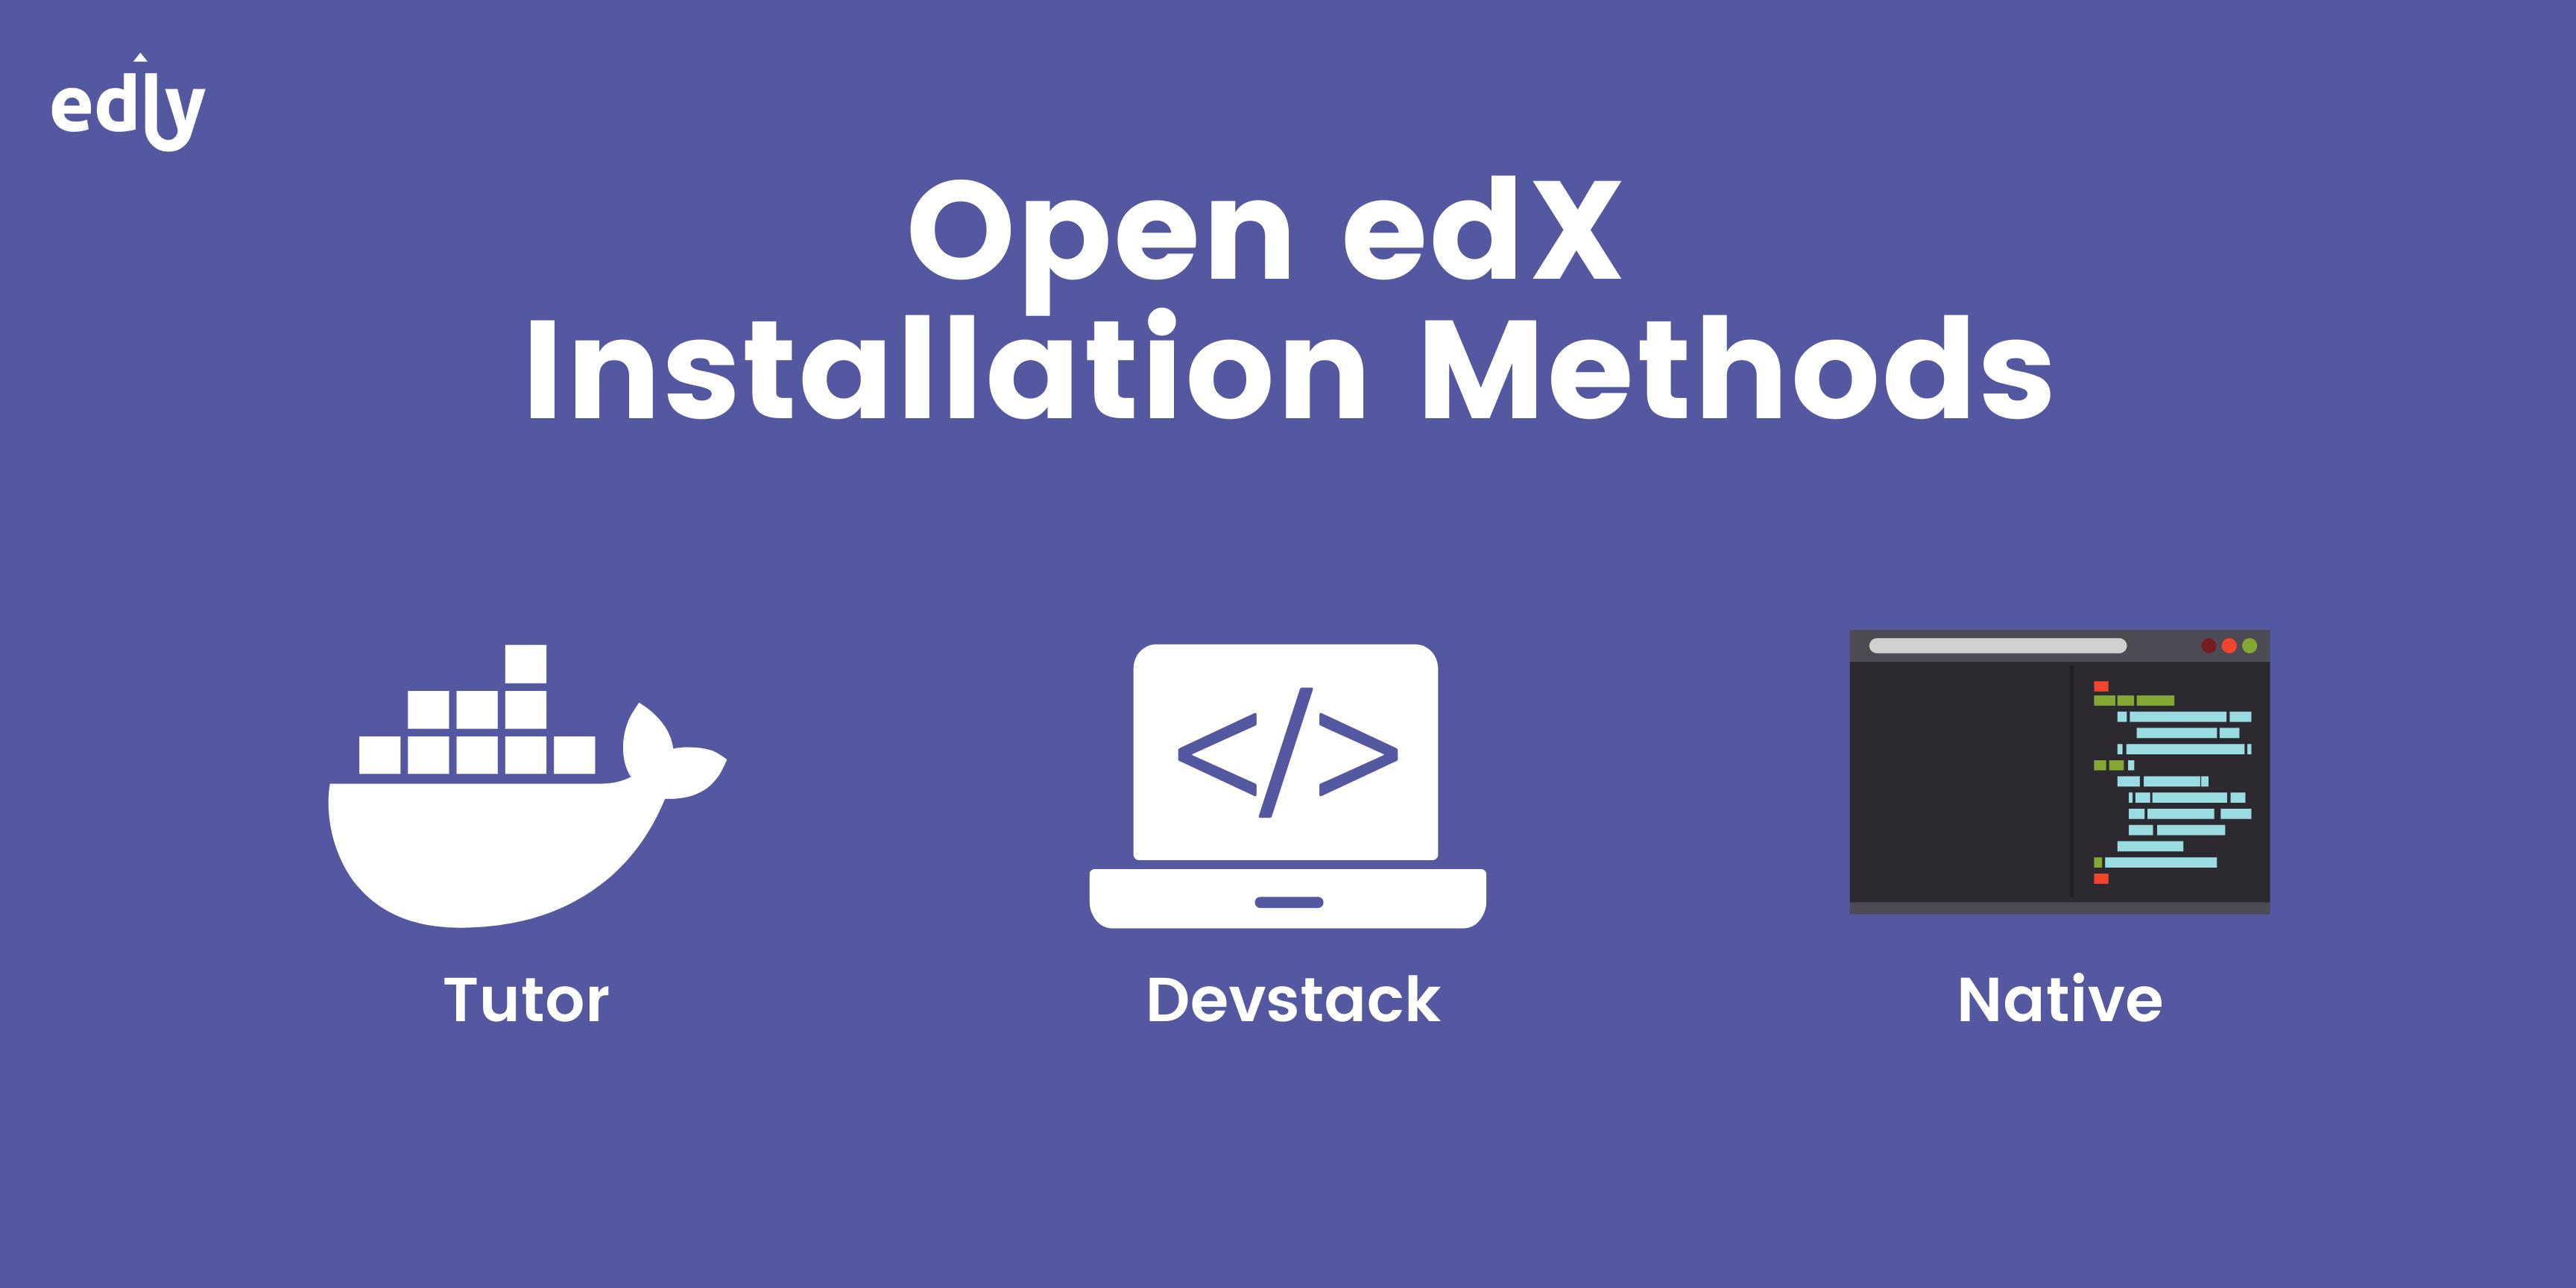 Infographic on Open edX Installation Methods